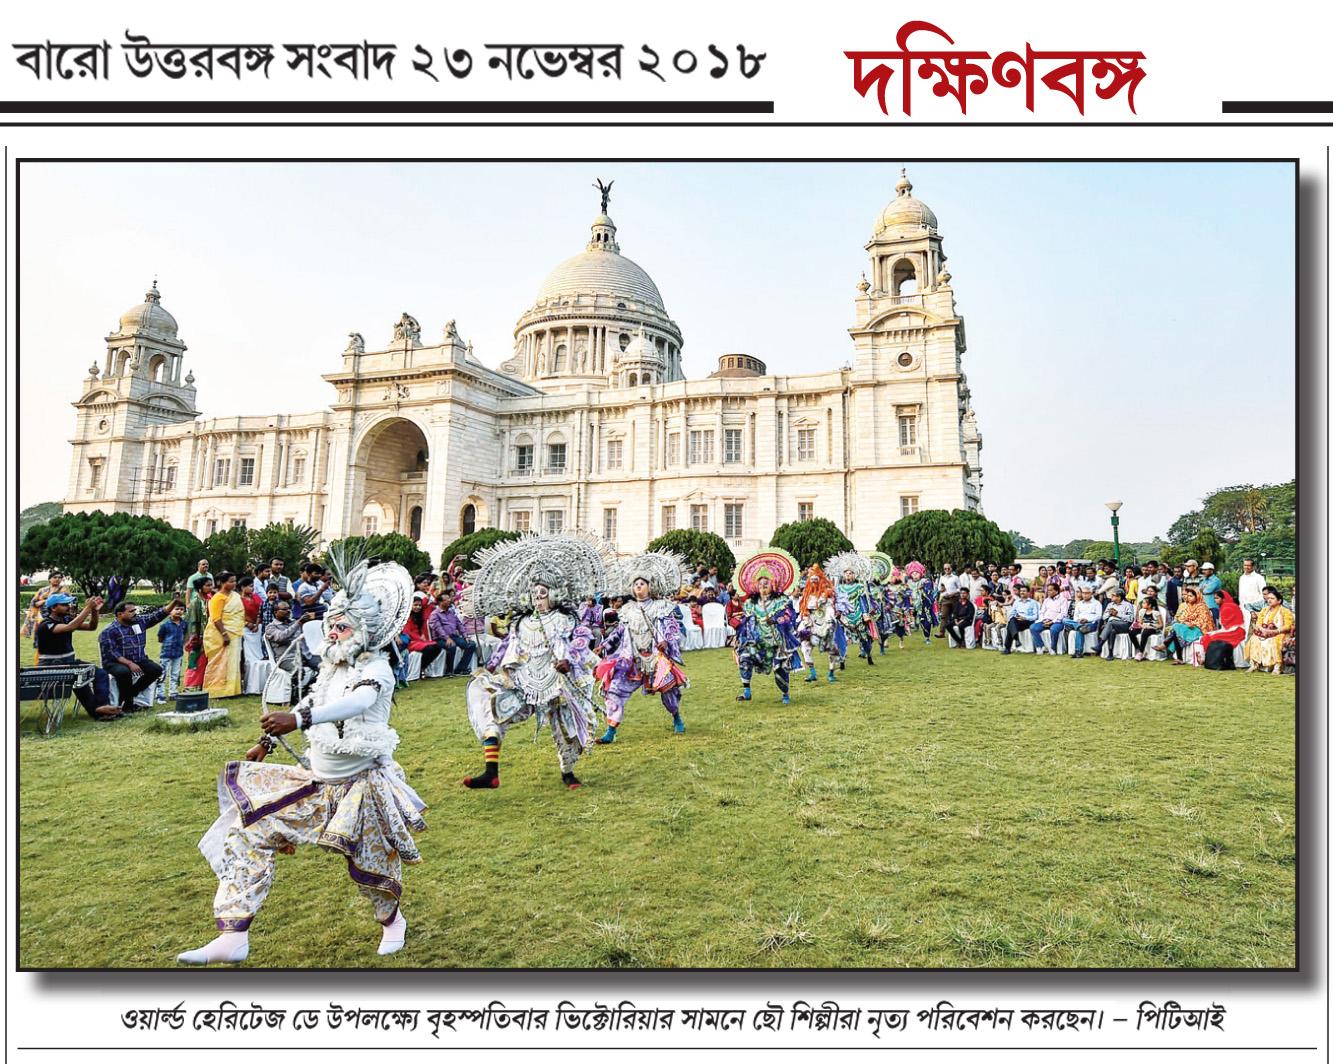 News clippings of Chau Utsav 2018, Uttarbanga Sangbad 23 November 2018